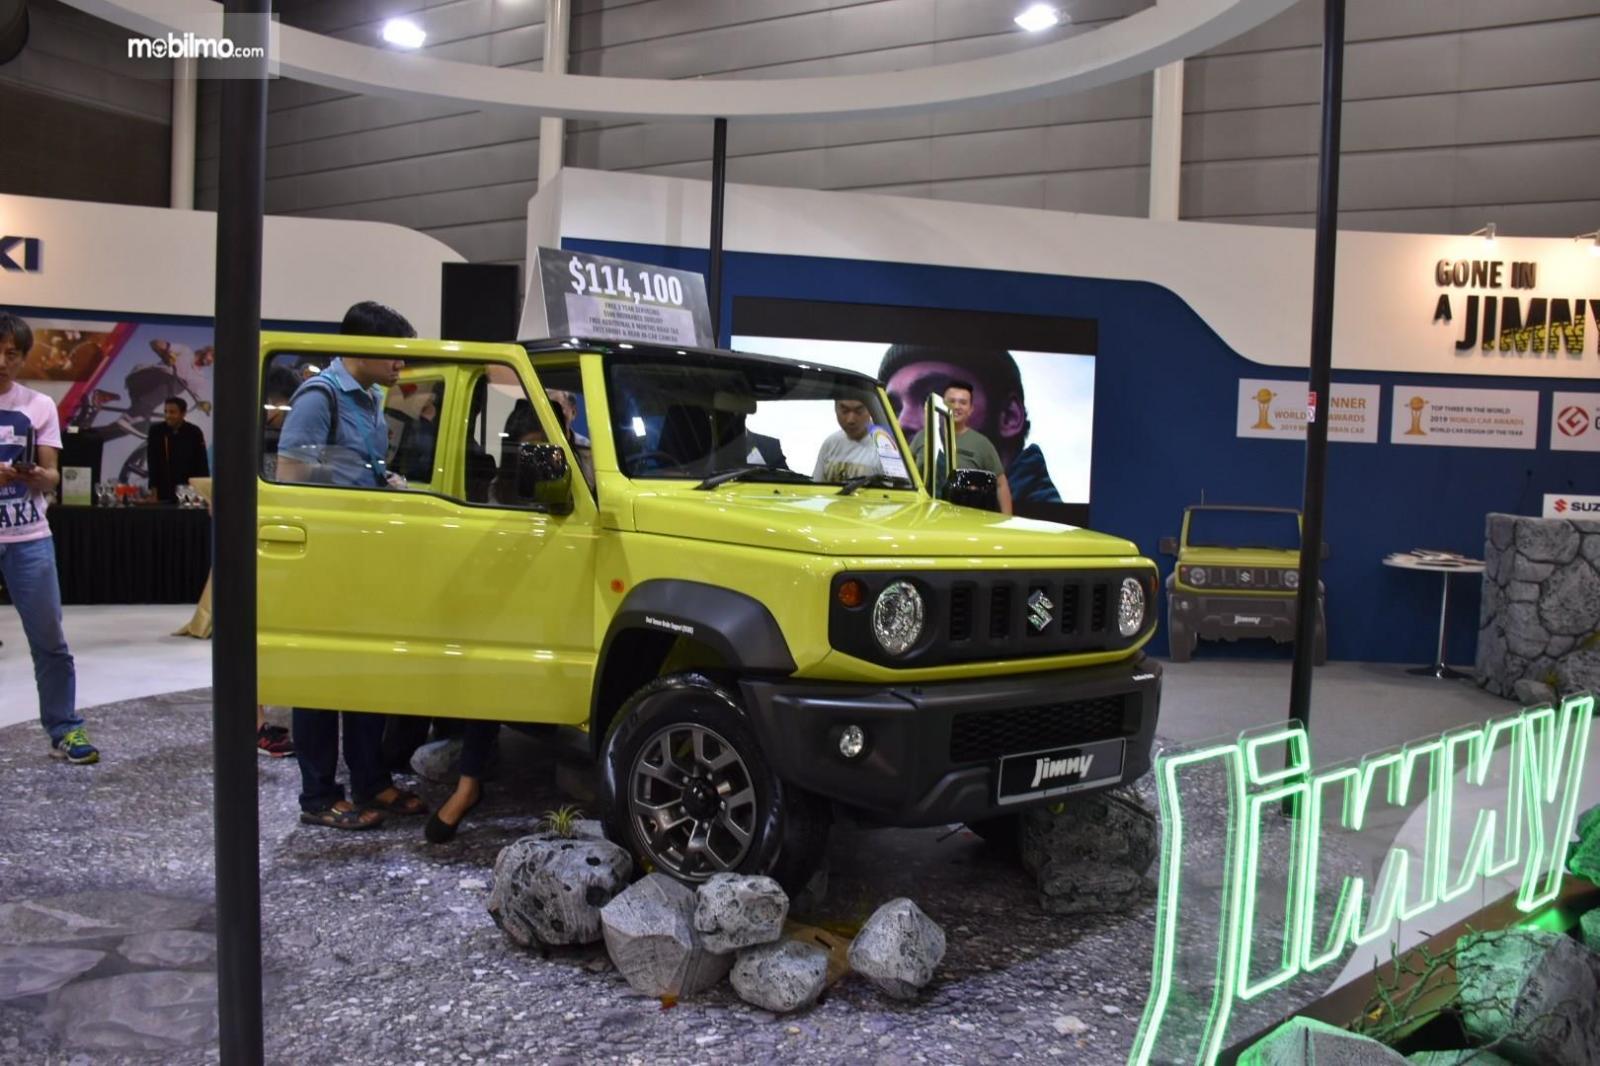 Tampilan Suzuki Jimny di pameran otomotif Cars@Expo 201 Singapura, menggoda pengunjung